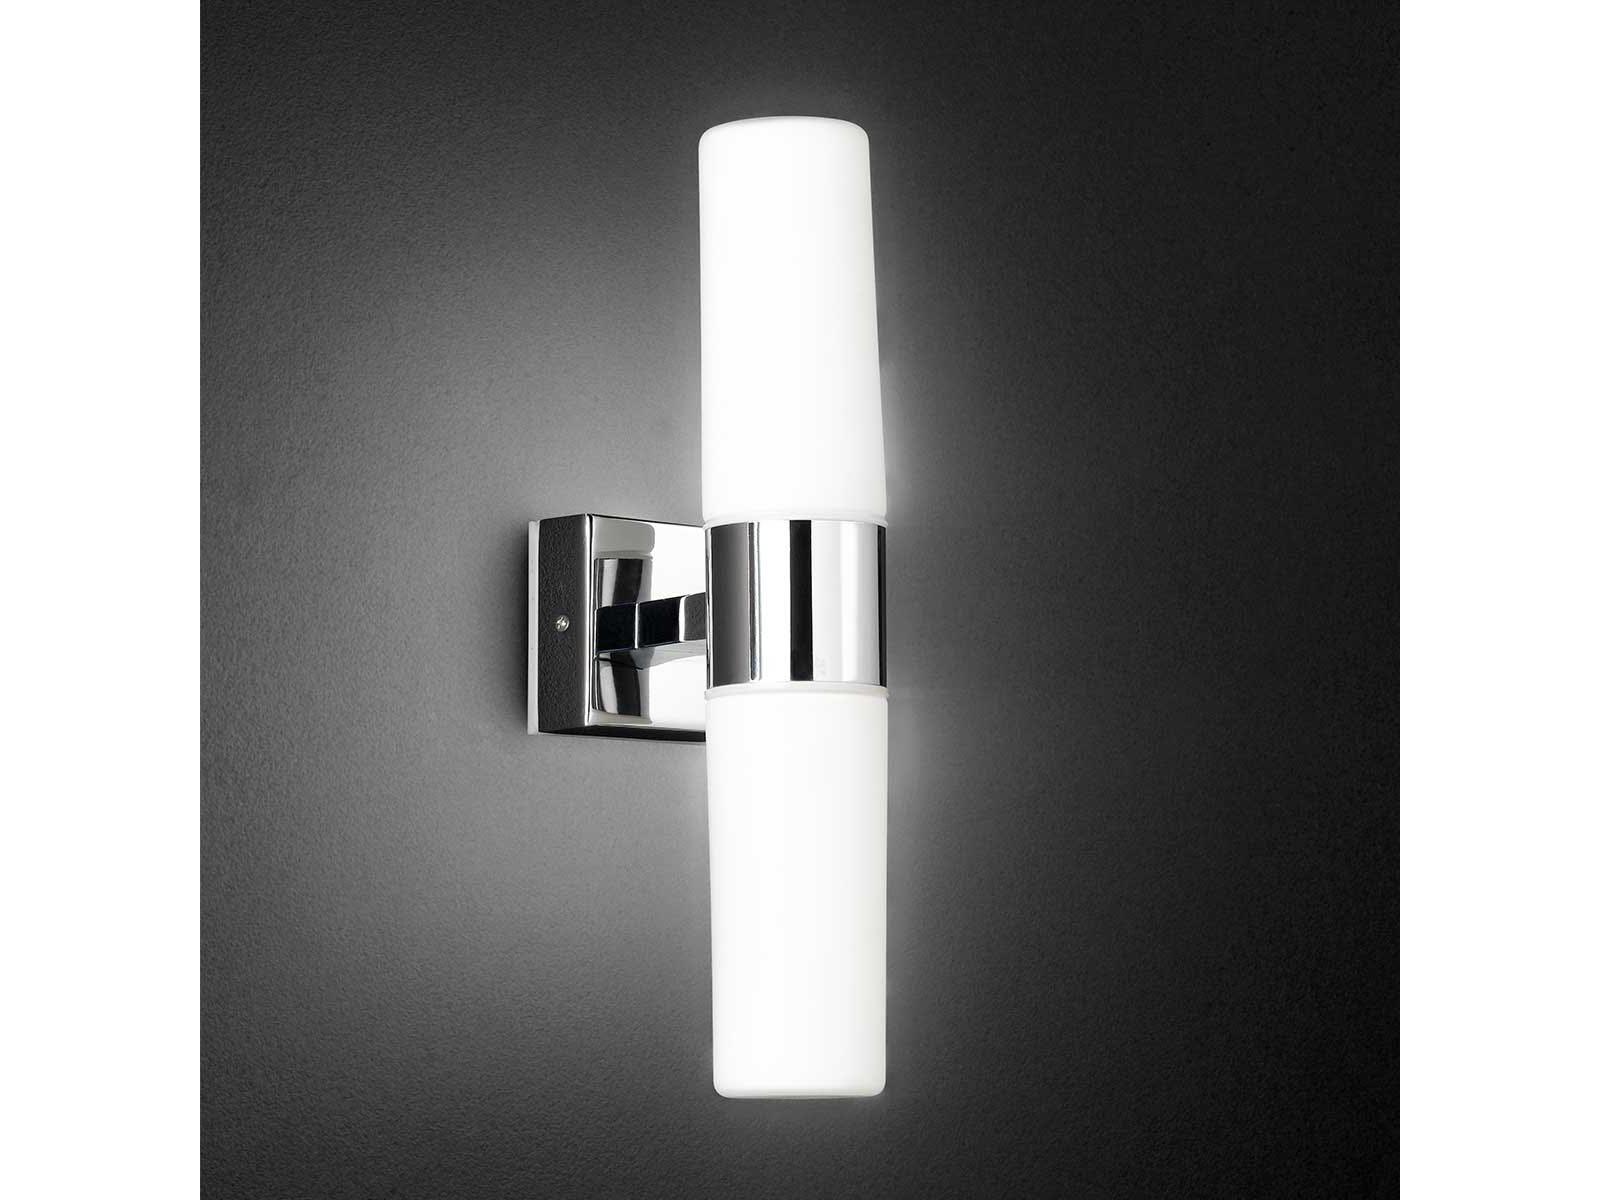 LED Wandlampe fürs Bad, Chrom / Glas weiß, Wofi-Leuchten | eBay